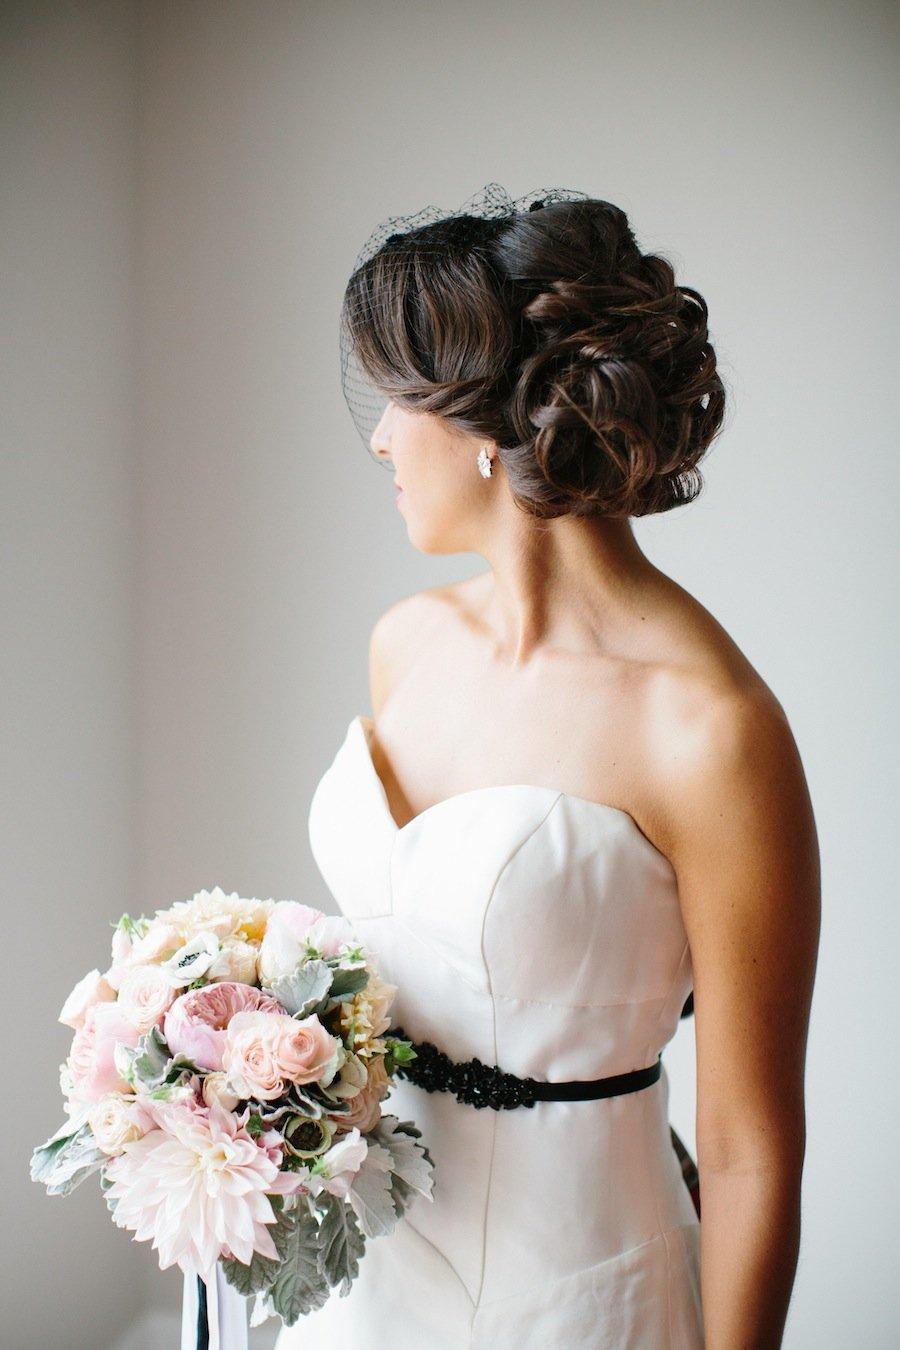 13 Times We Had Major Wedding Hair Envy Washingtonian Dc